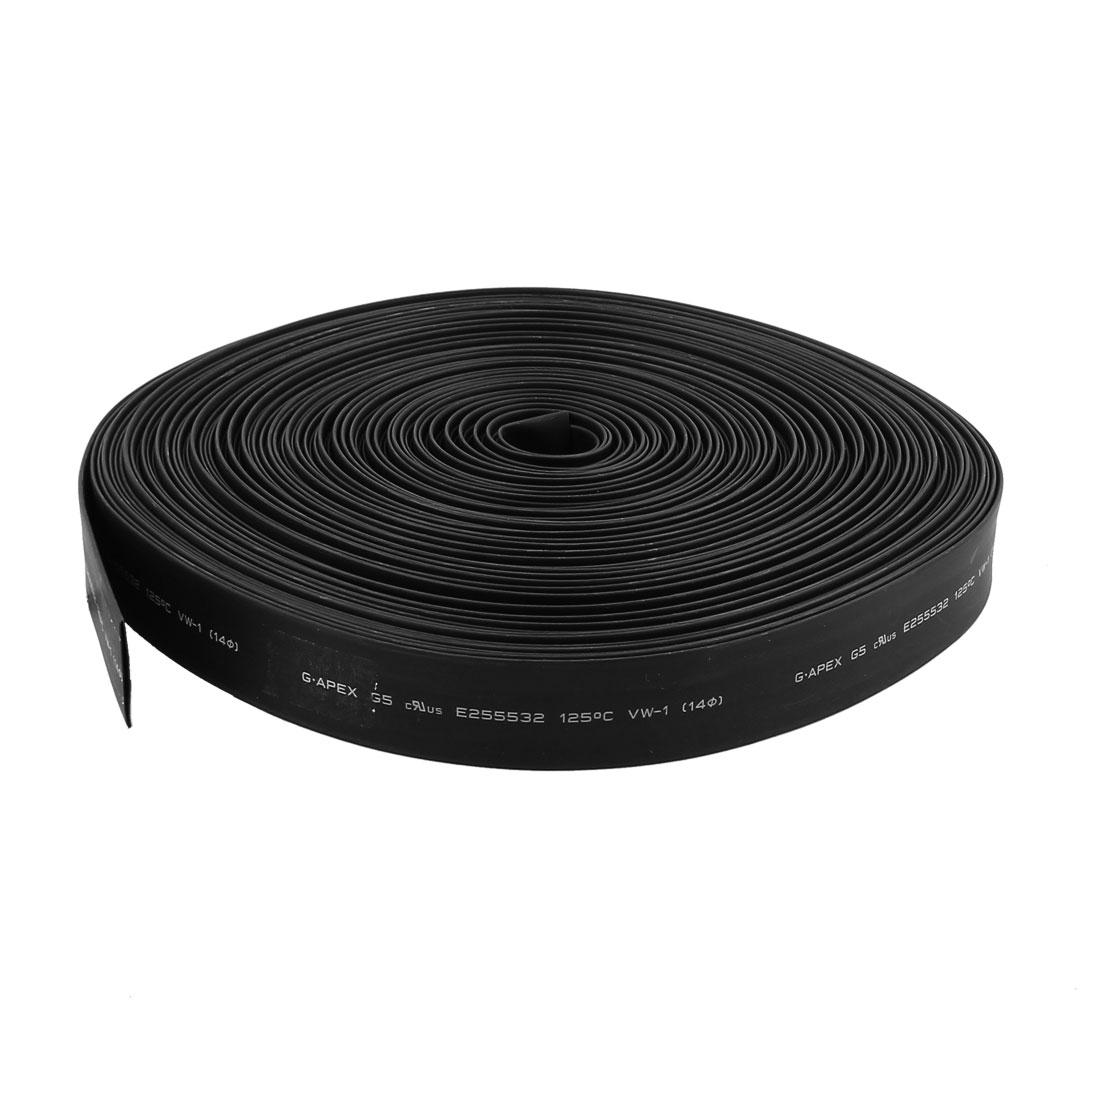 30m 14mm Dia Insulated Heat Shrink Tubing 2:1 Shrinkage Ratio Waterproof Black